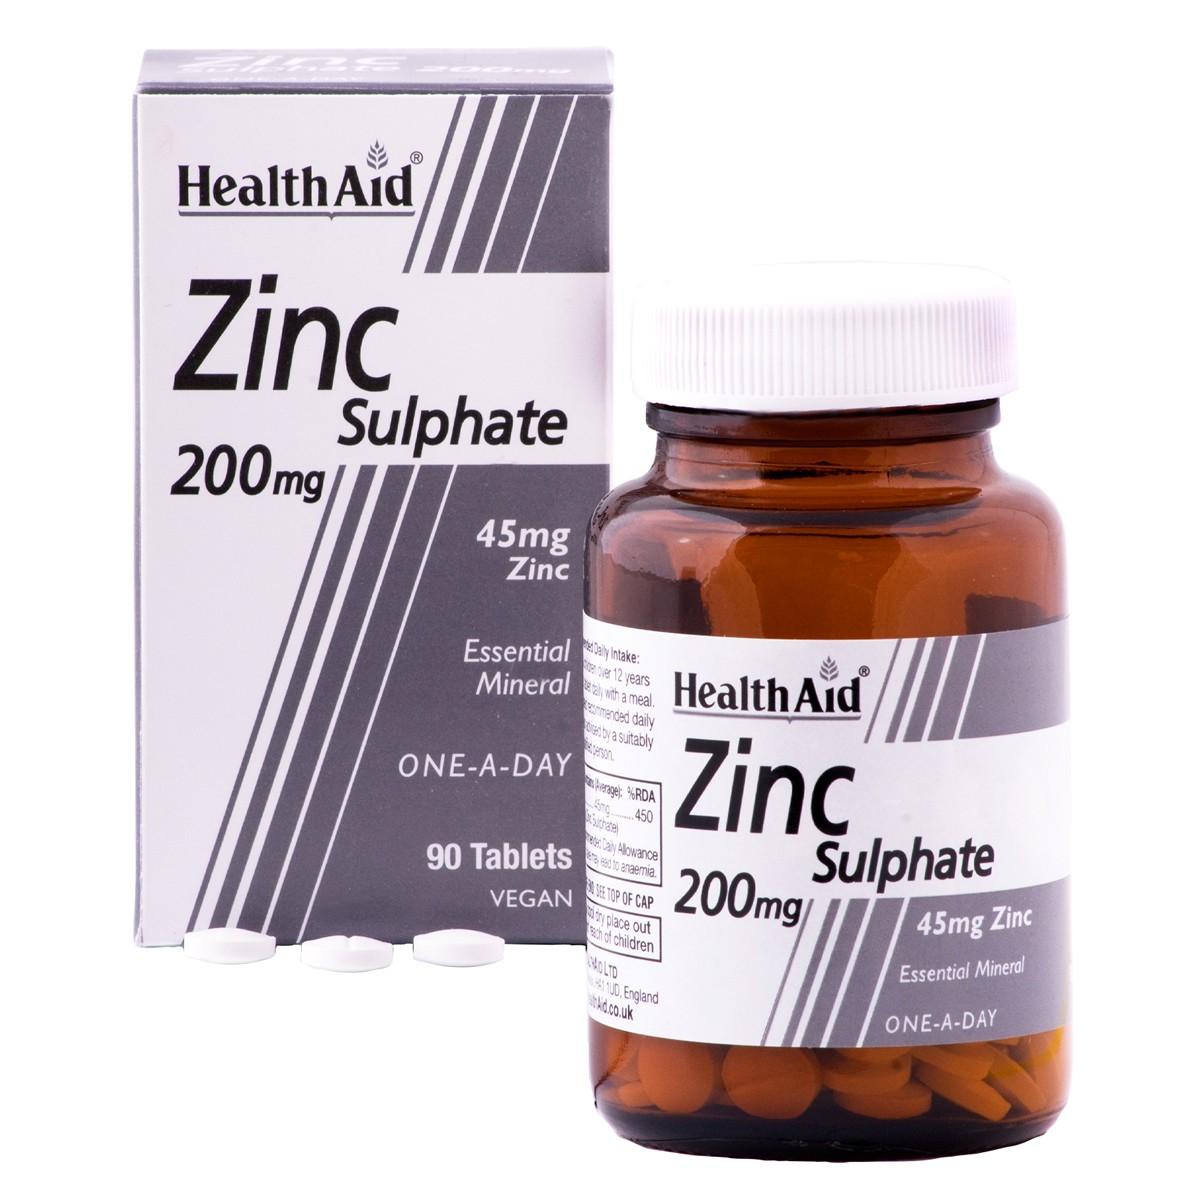 HealthAid Zinc Sulphate 200mg (45mg elemental Zinc)